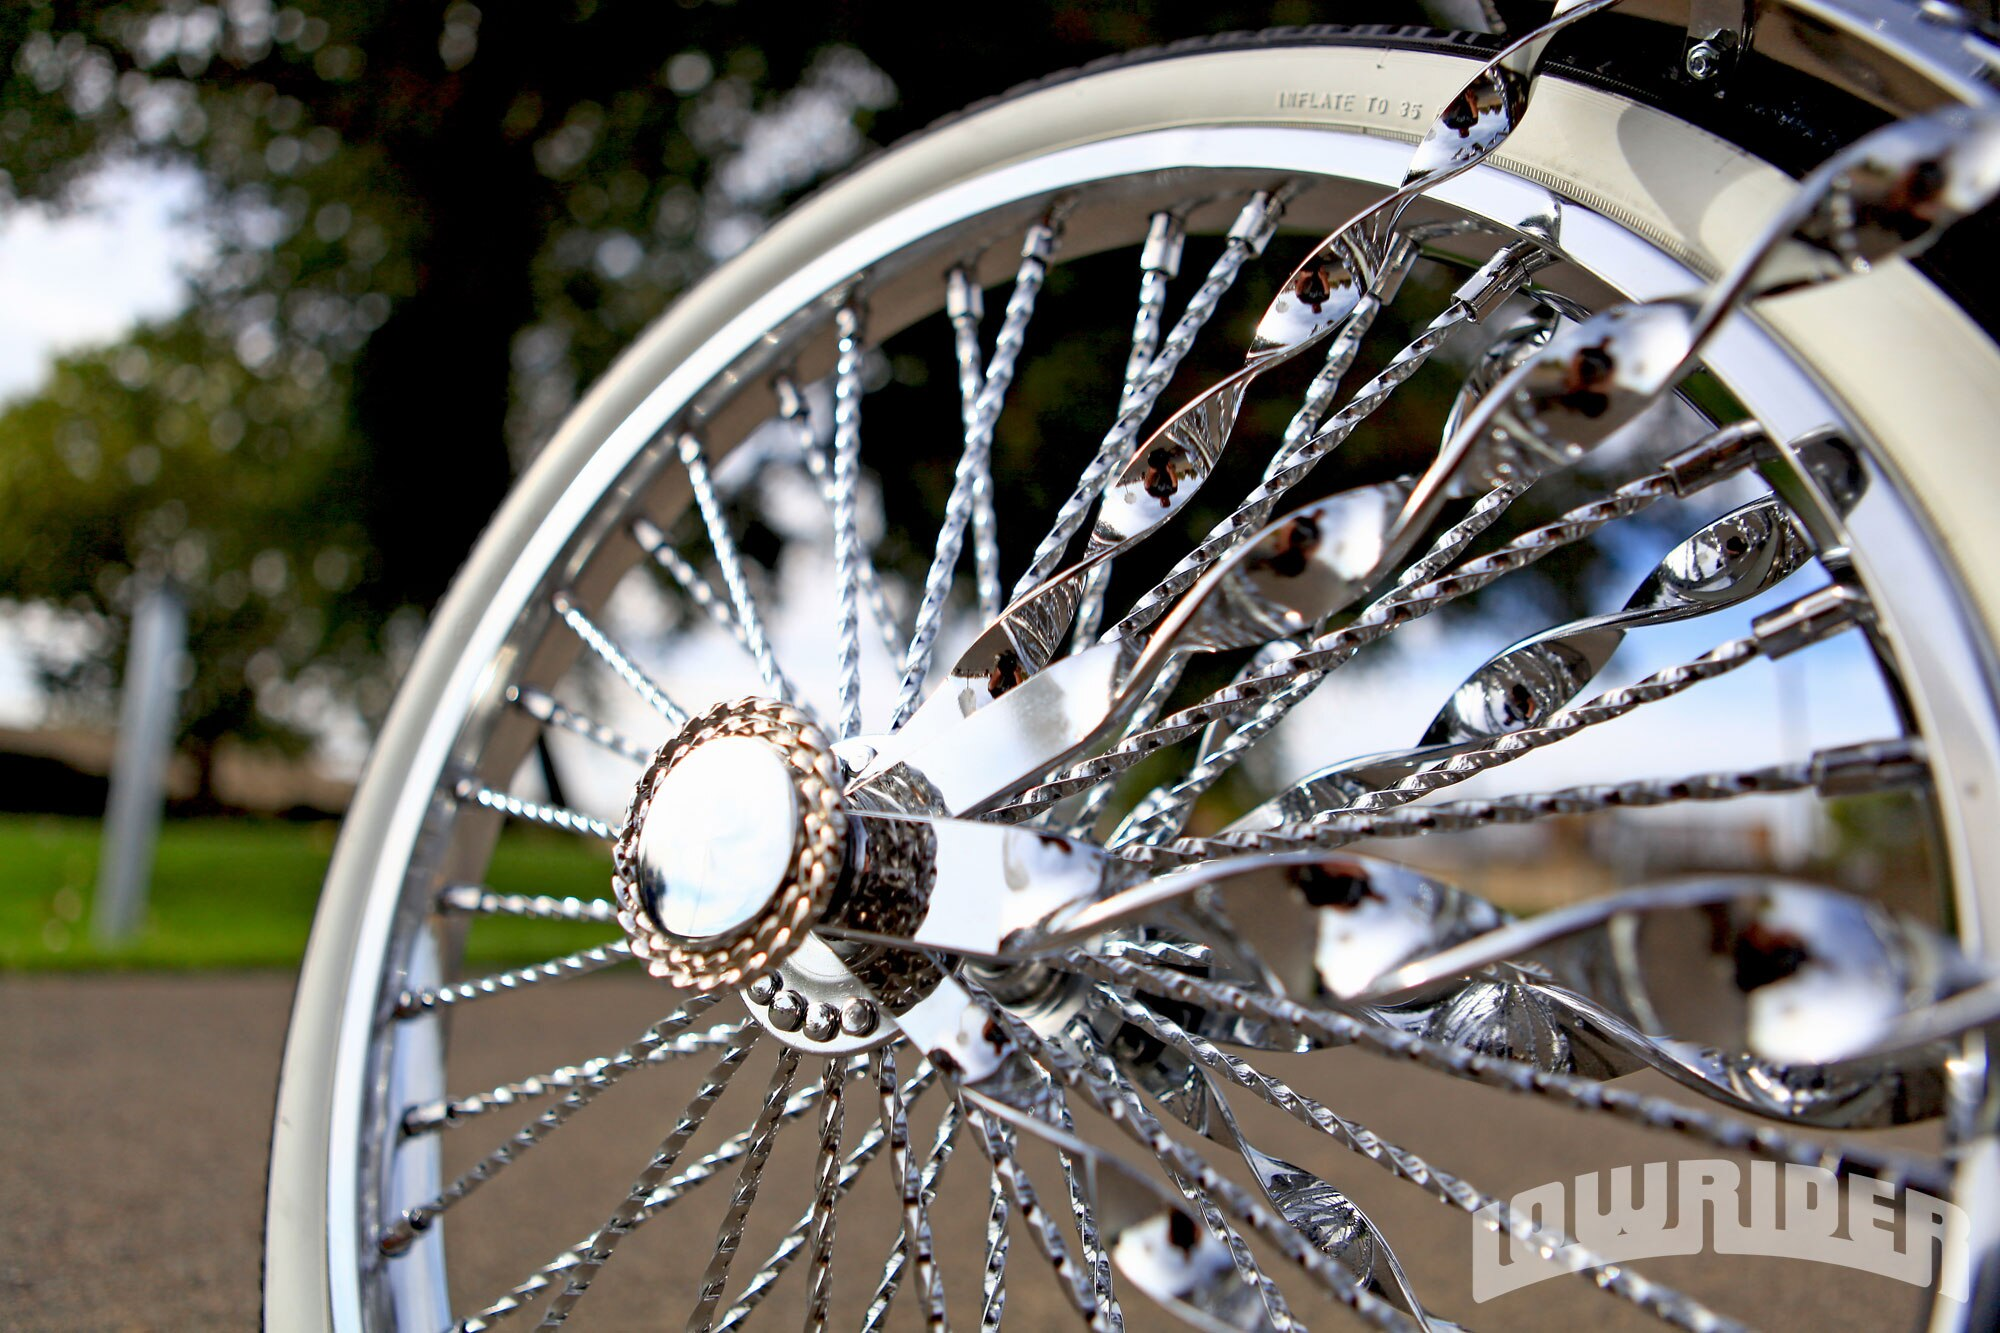 Adrian Hernandez S Lowrider Bicycle Li L Rascal Lowrider Magazine